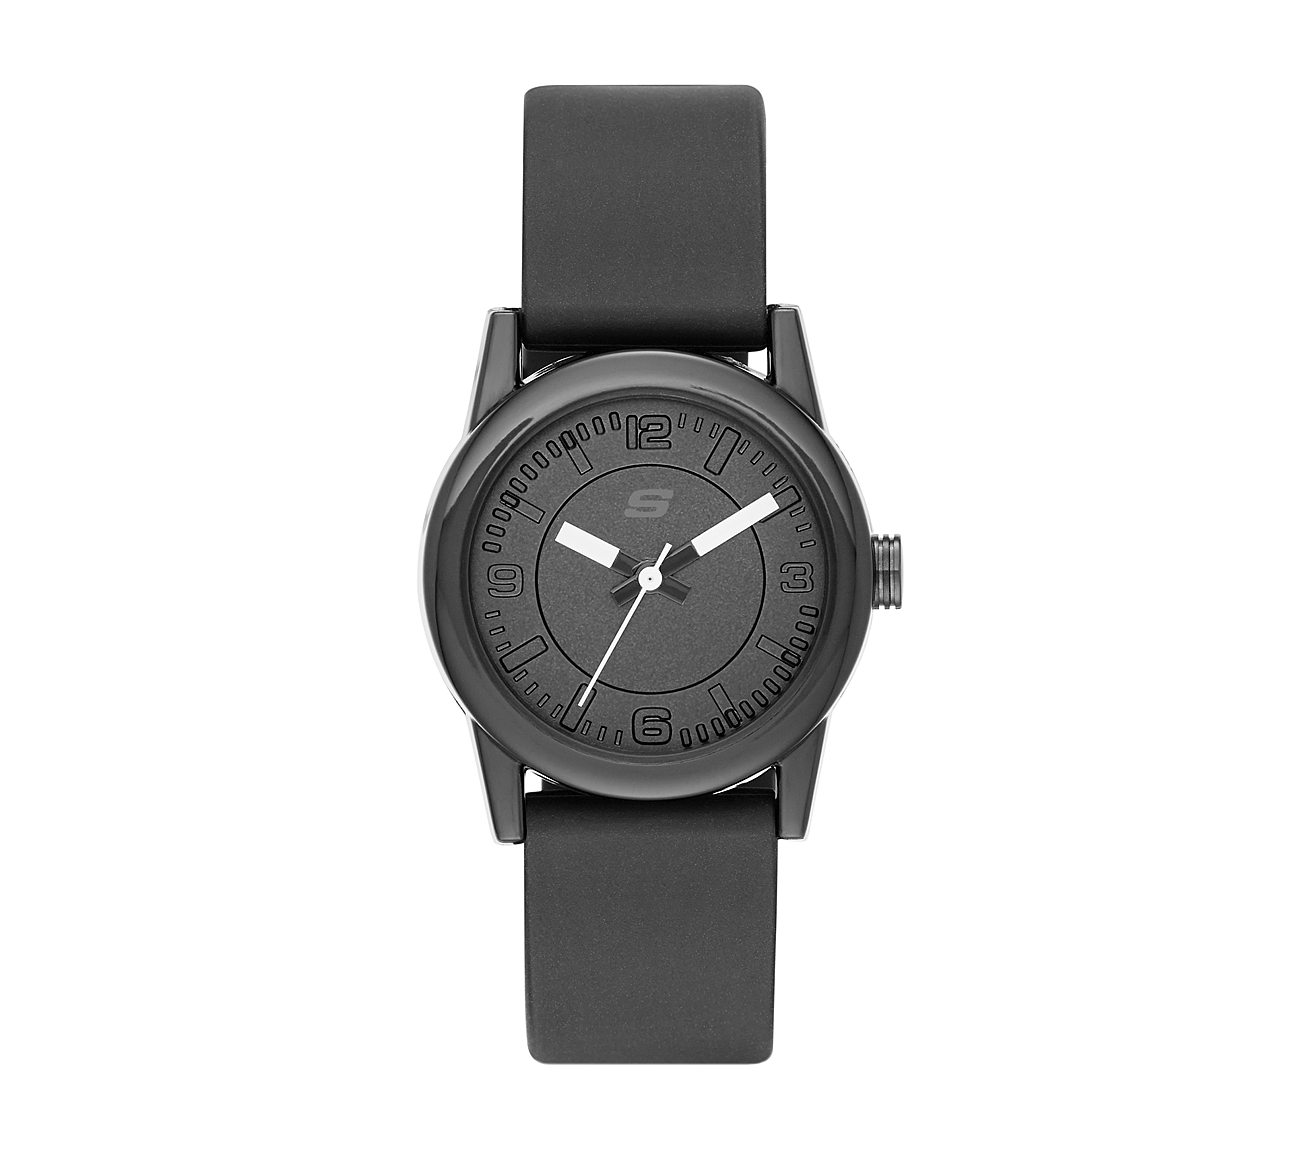 Rosencrans Mini Watch